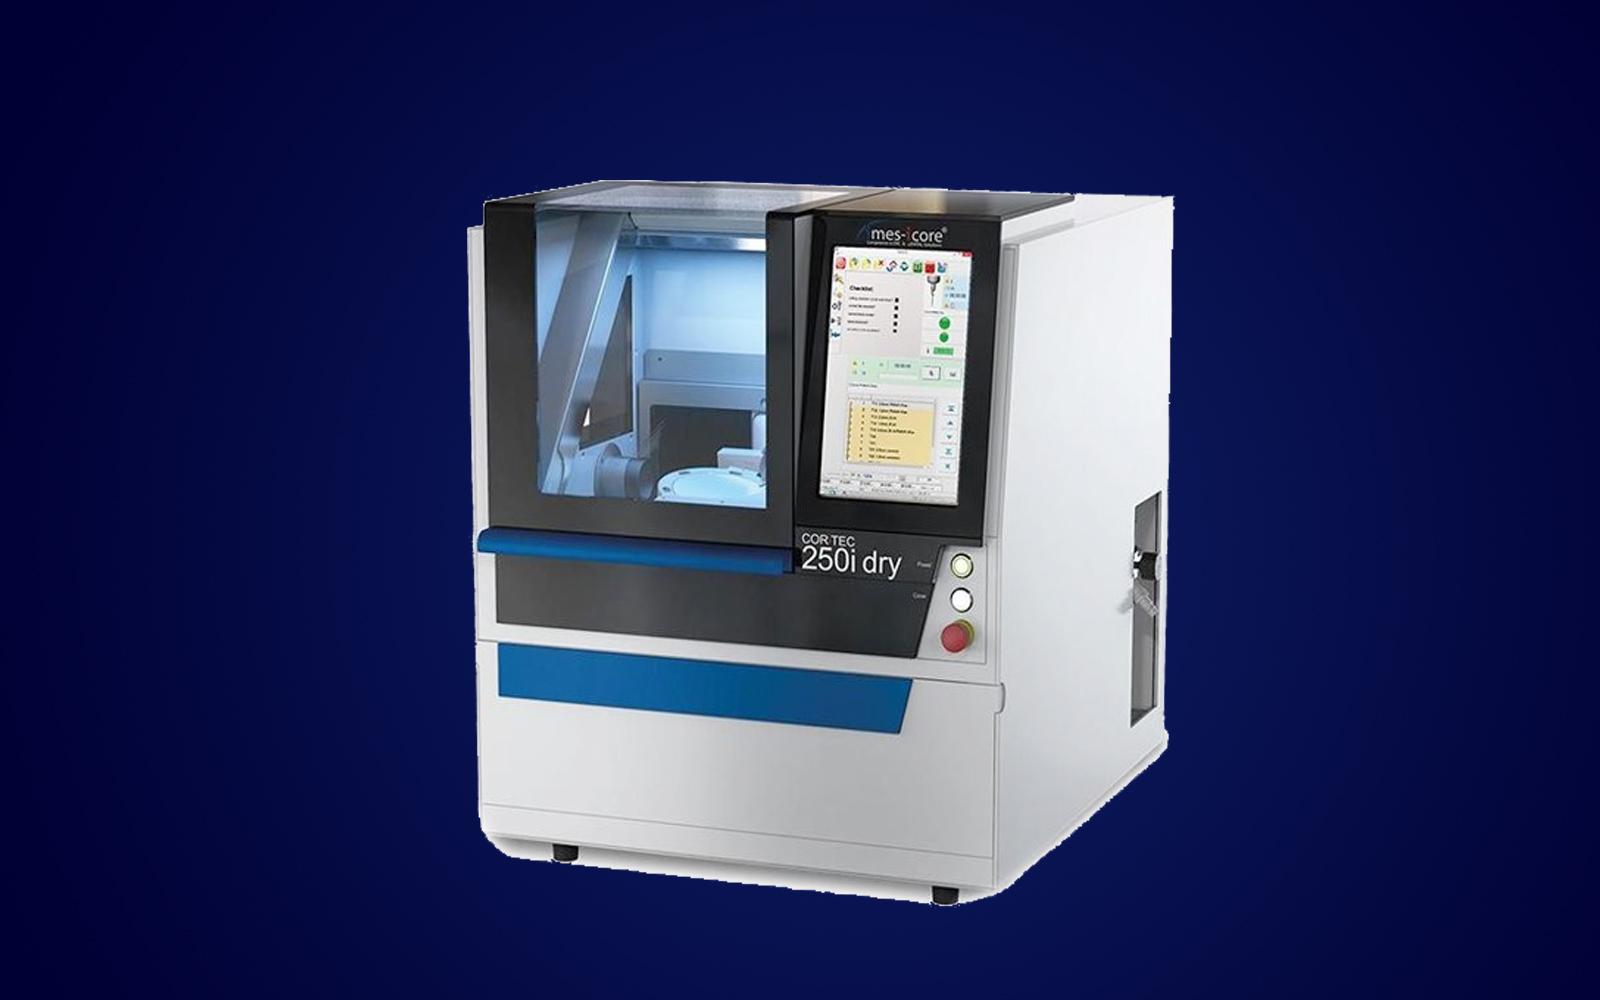 250i dry milling machine